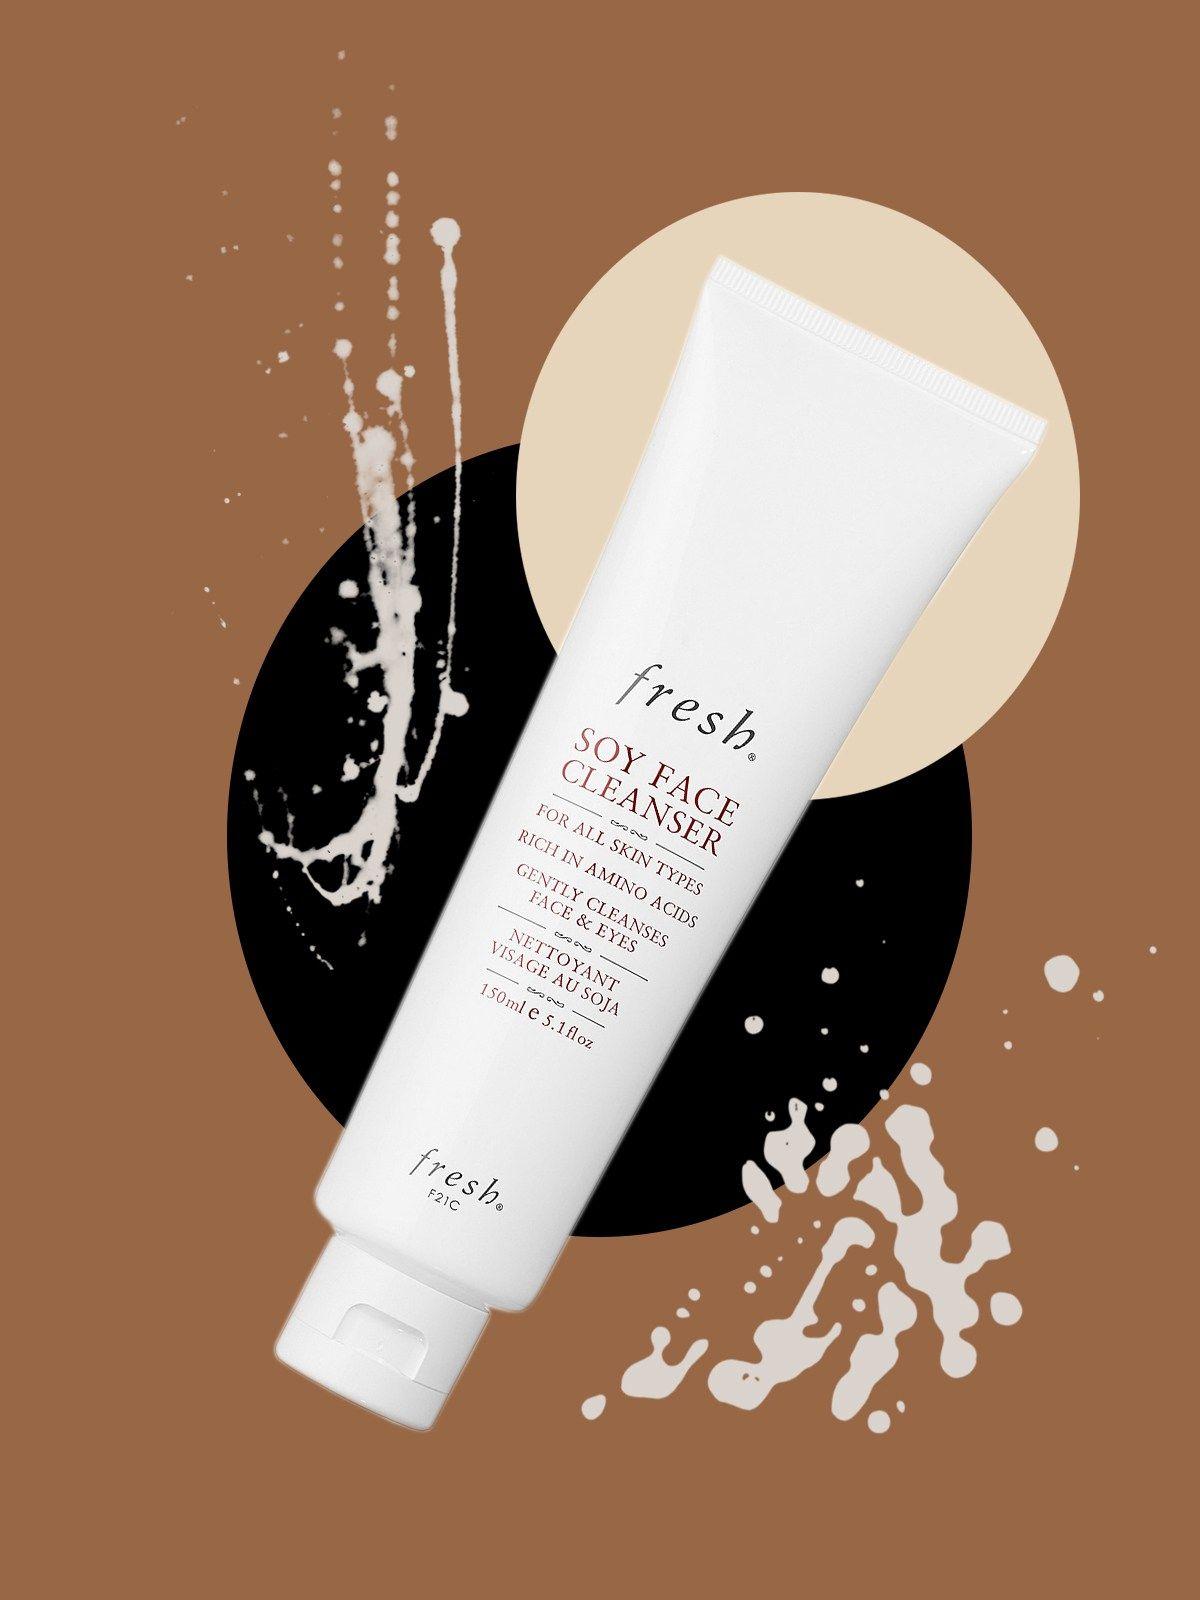 Fresh Soy Face Cleanser Milk